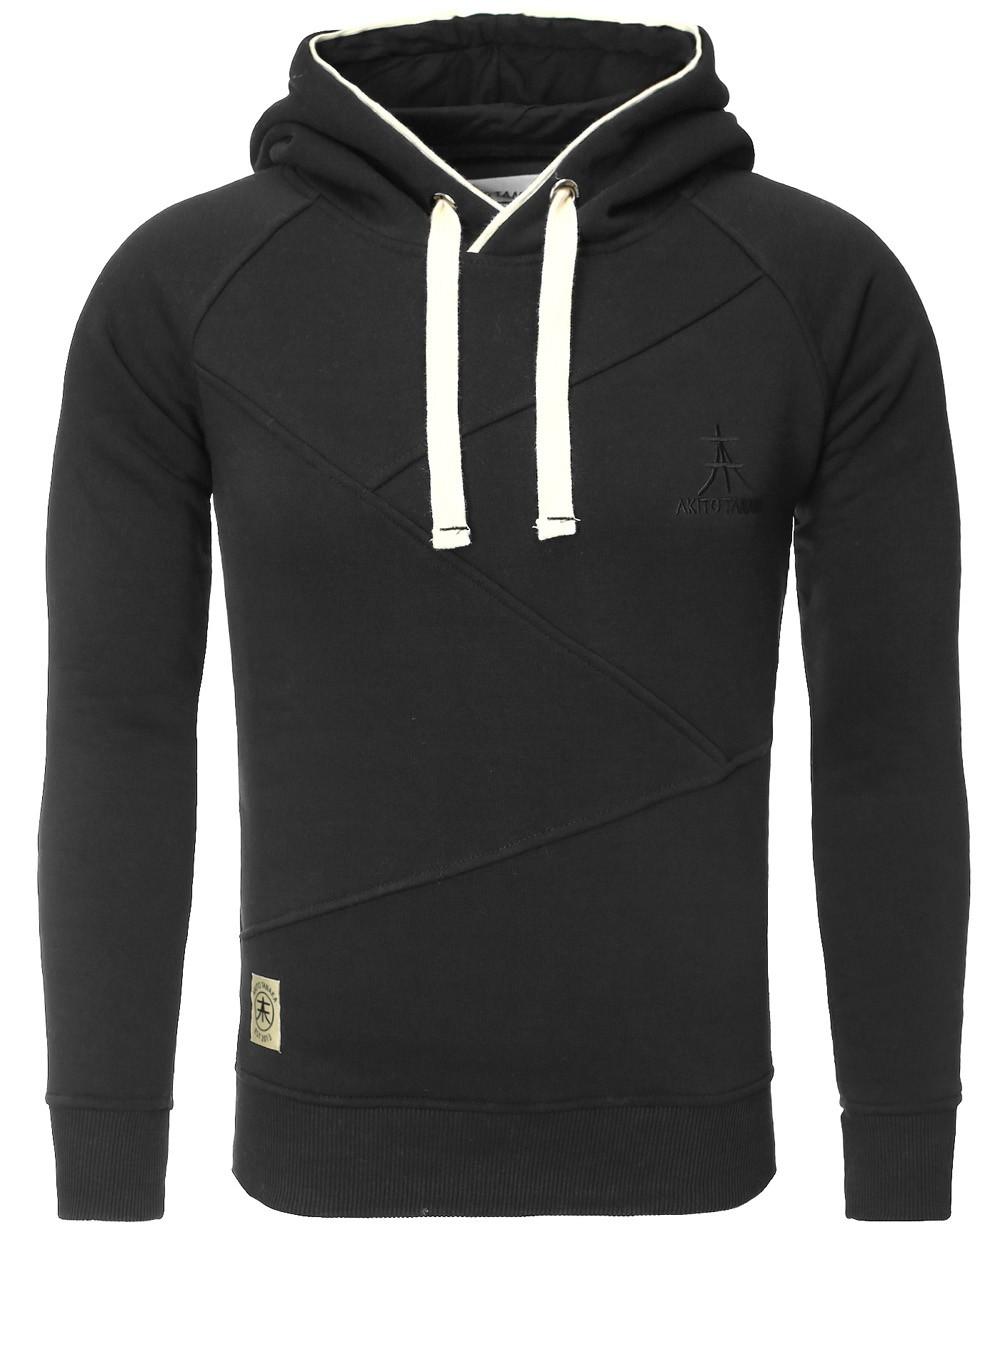 tanaka sweatshirt sweater pullover kapuze slimfit fur herren manner. Black Bedroom Furniture Sets. Home Design Ideas